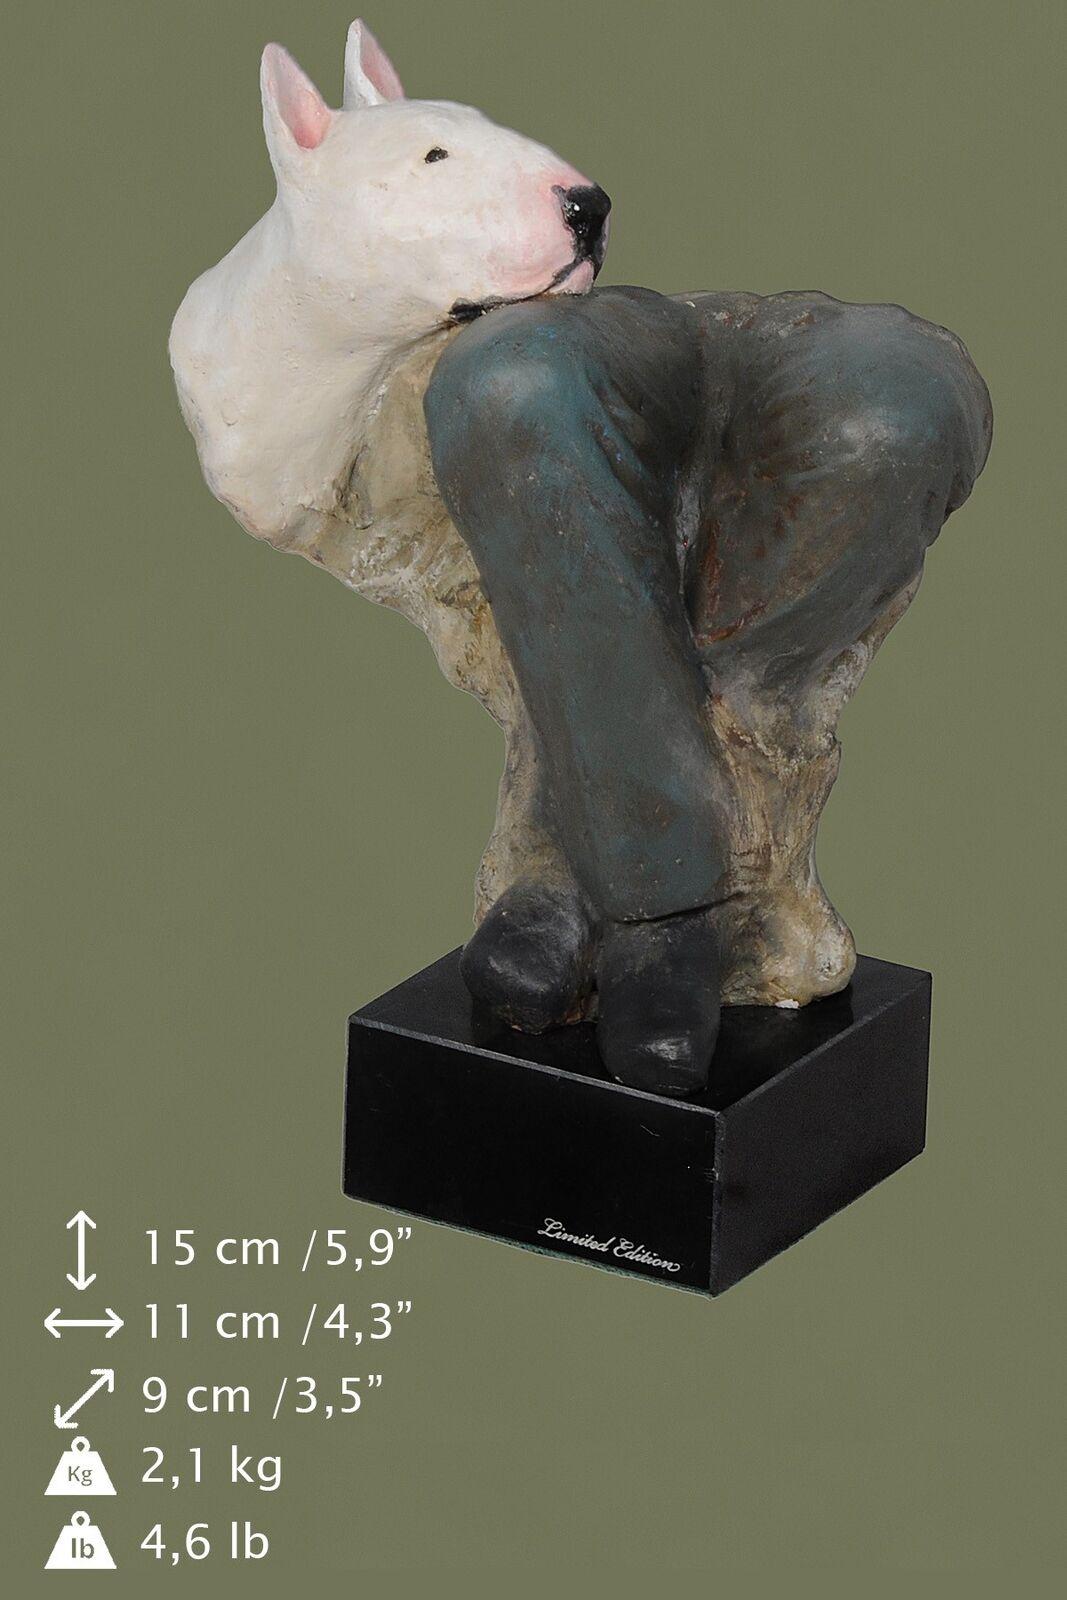 Bull Terrier - statuetta di cane in bronzo dipinta, Art Dog IT